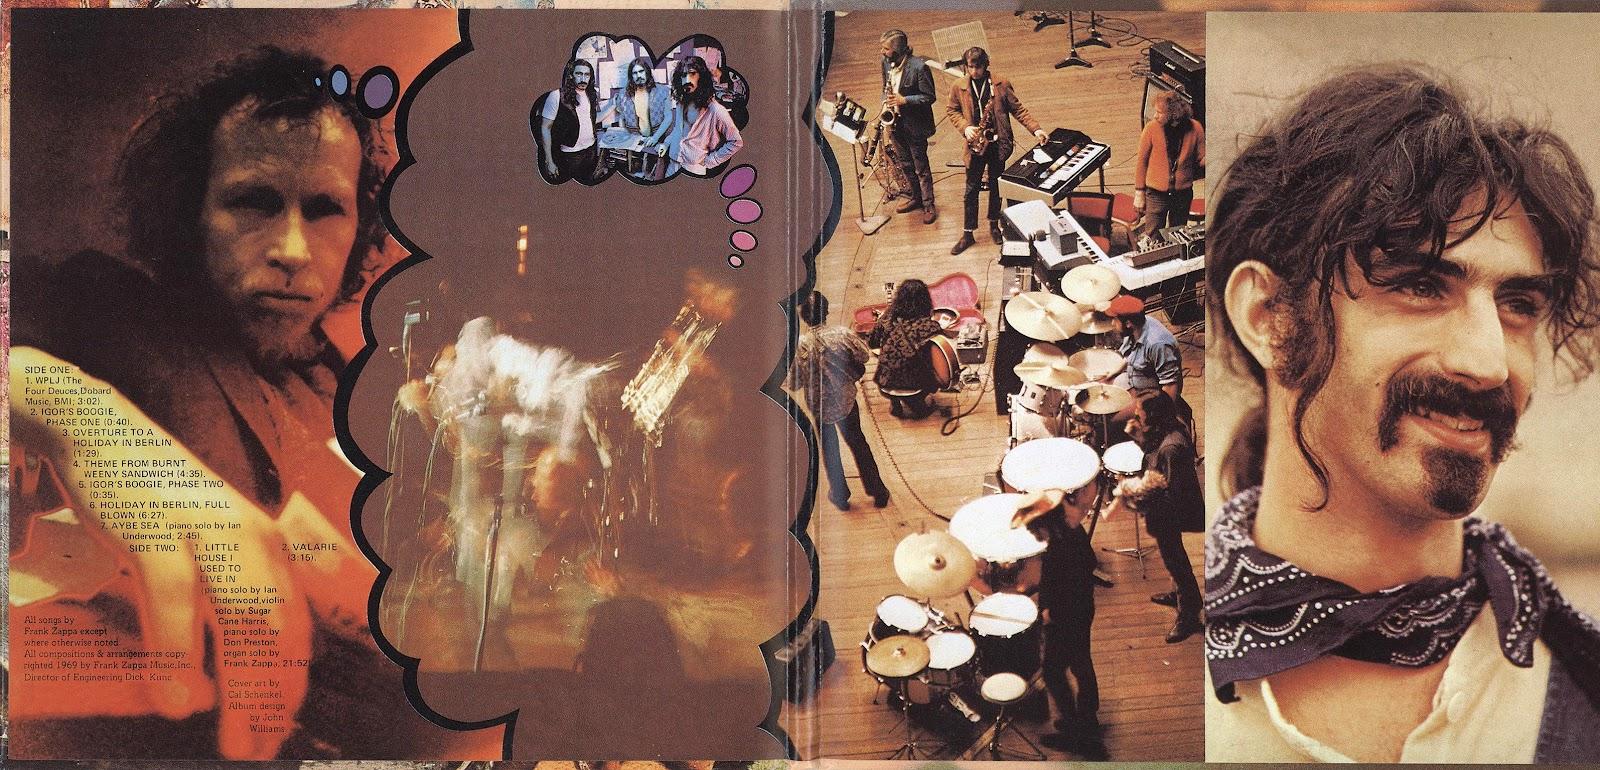 Frank Zappa – Burnt Weeny Sandwich (Zappa Records/Universal) CD REVIEW